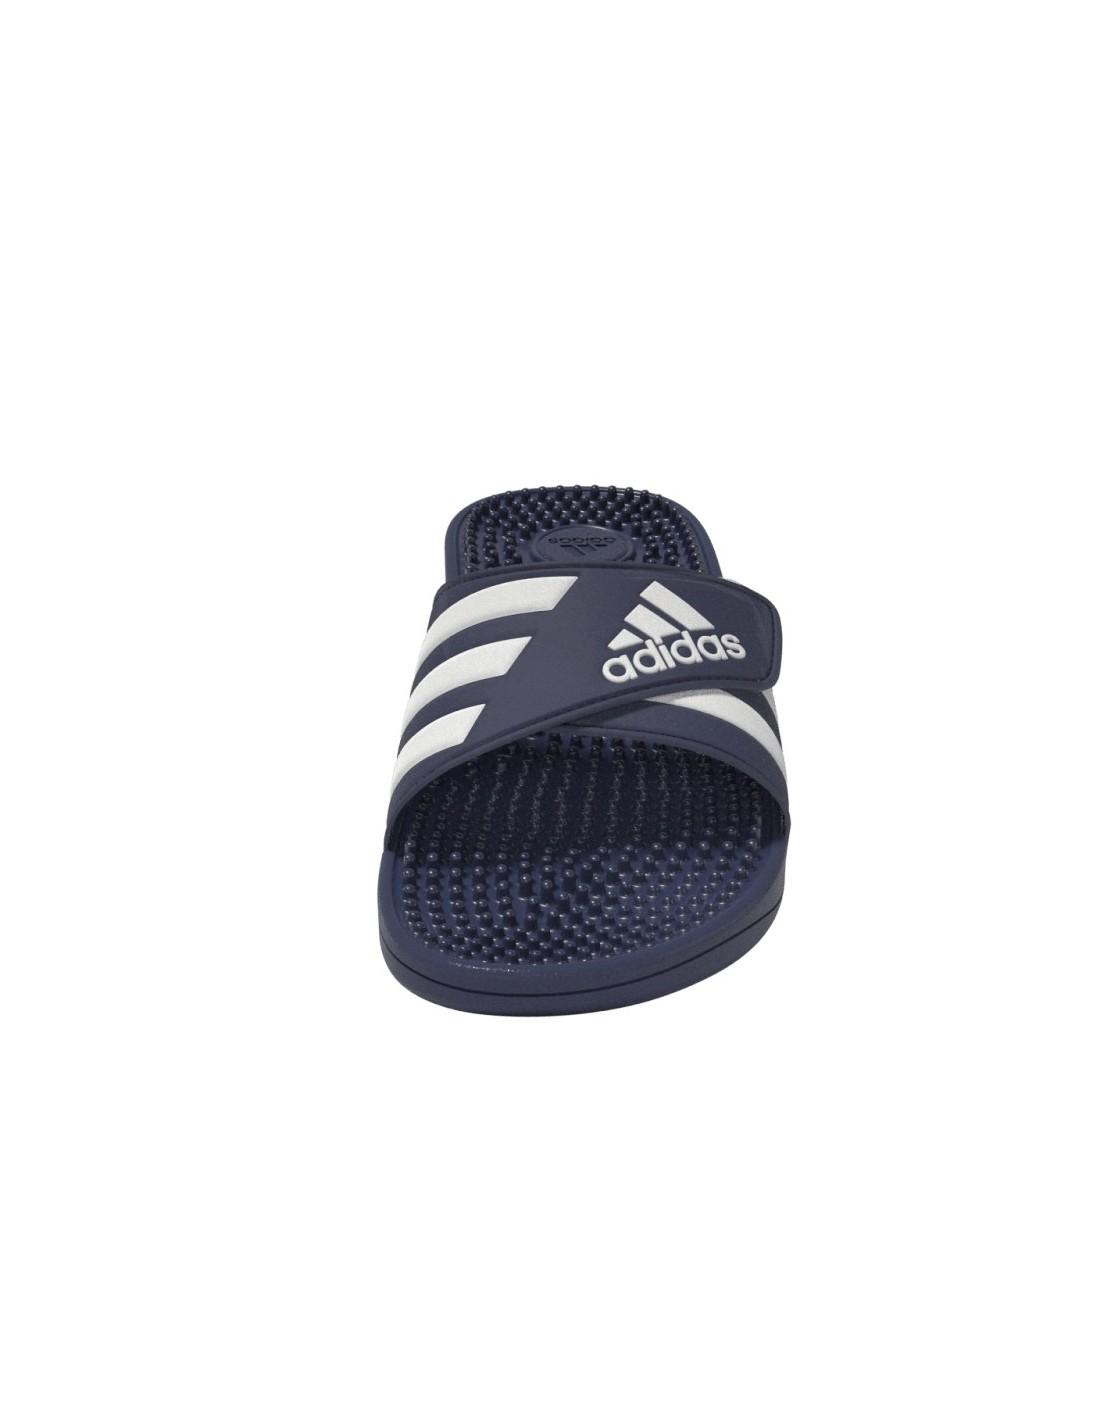 Yb Adidas 3s Pant Negro Turini Tiro Ro Pantalon 54qwAB